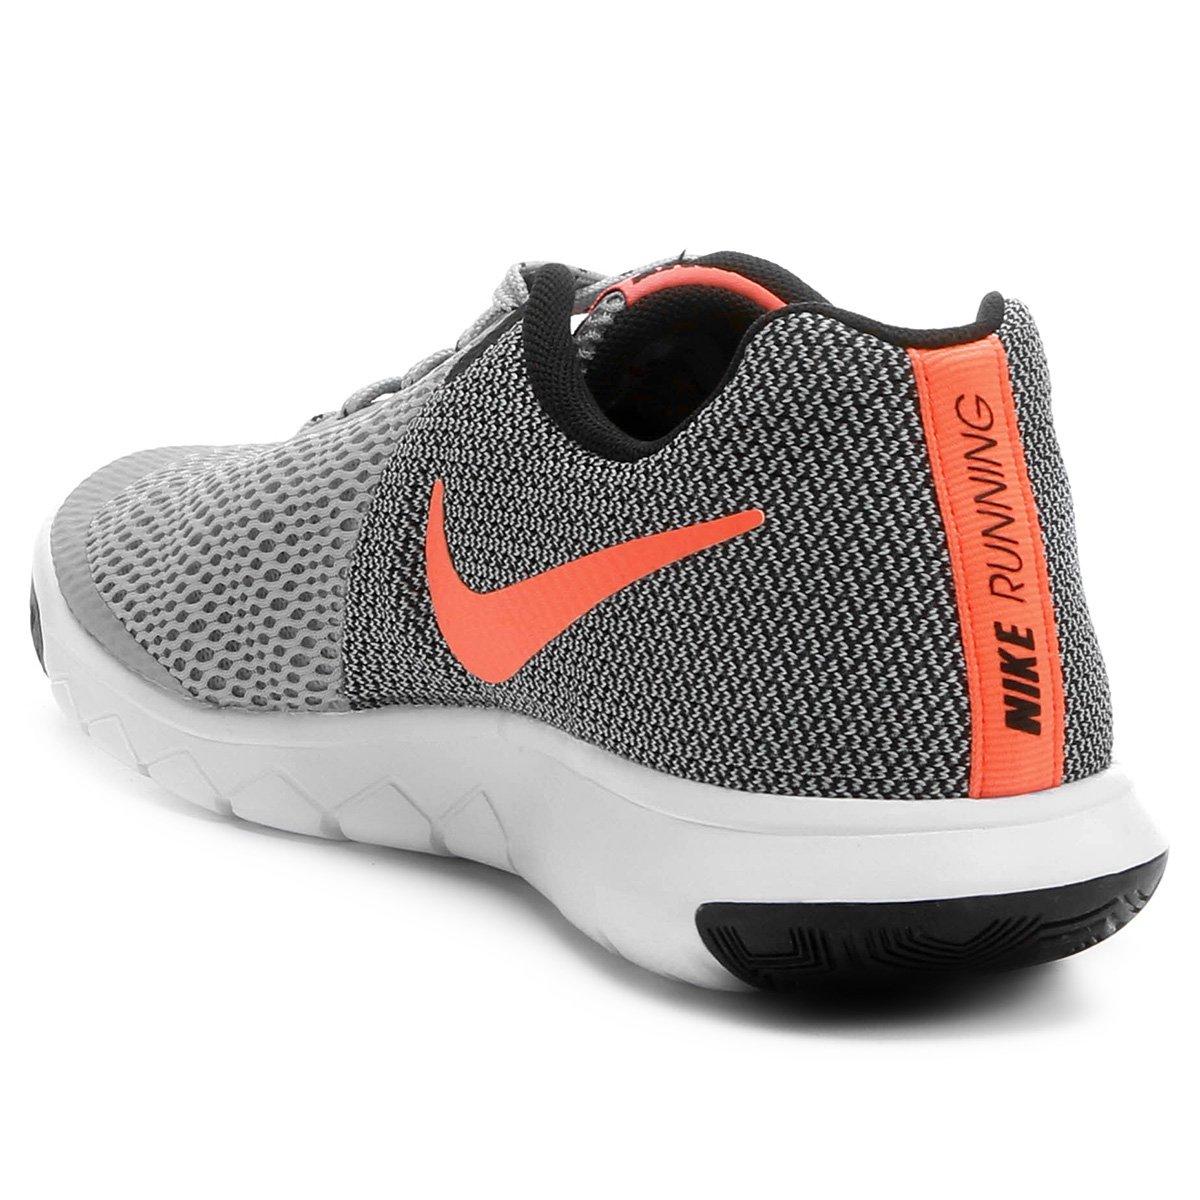 aba3442507 Tênis Nike Flex Experience Rn 5 Feminino - Compre Agora